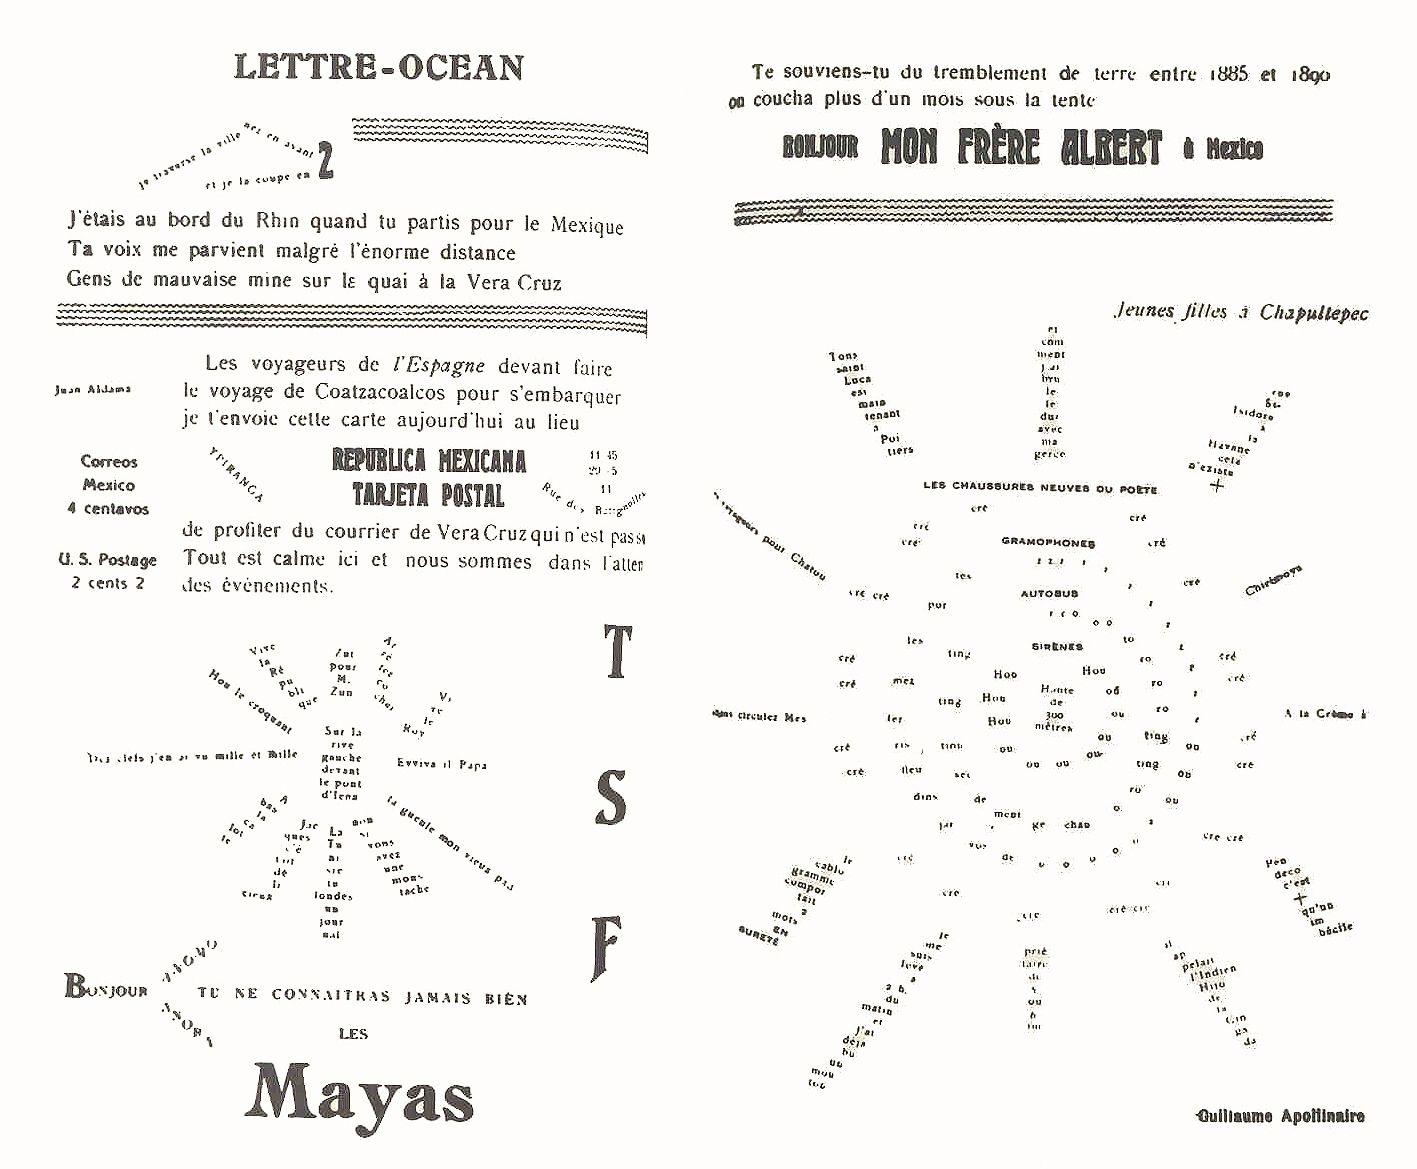 lettre océan Guillaume Apollinaire | 文字